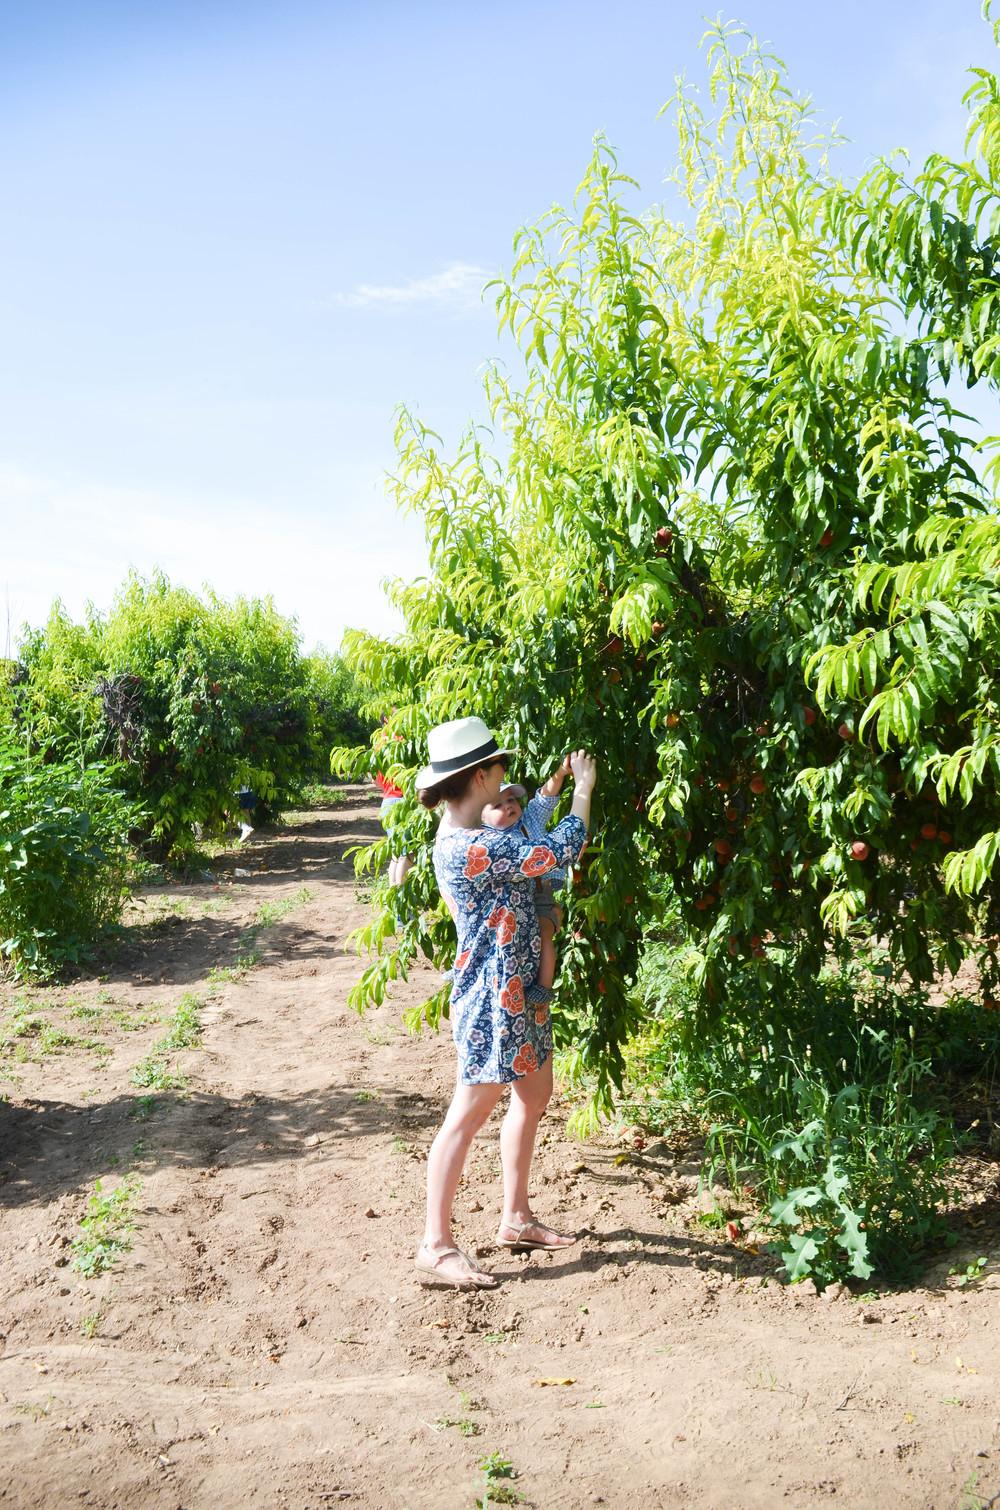 Picking Peaches at Schnepf Farm | Momma Society-The Community of Modern Moms | www.MommaSociety.com